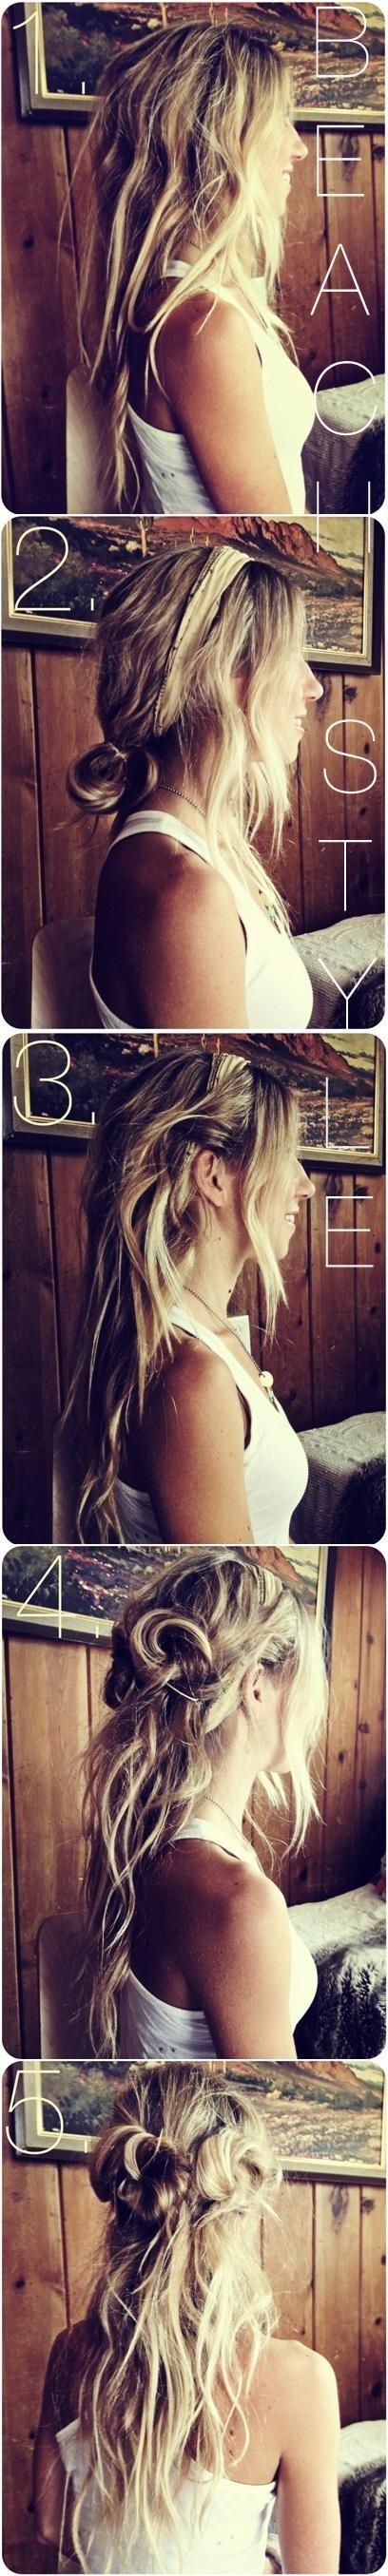 Lange Haare Tutorials: Cute Messy Beach Frisuren